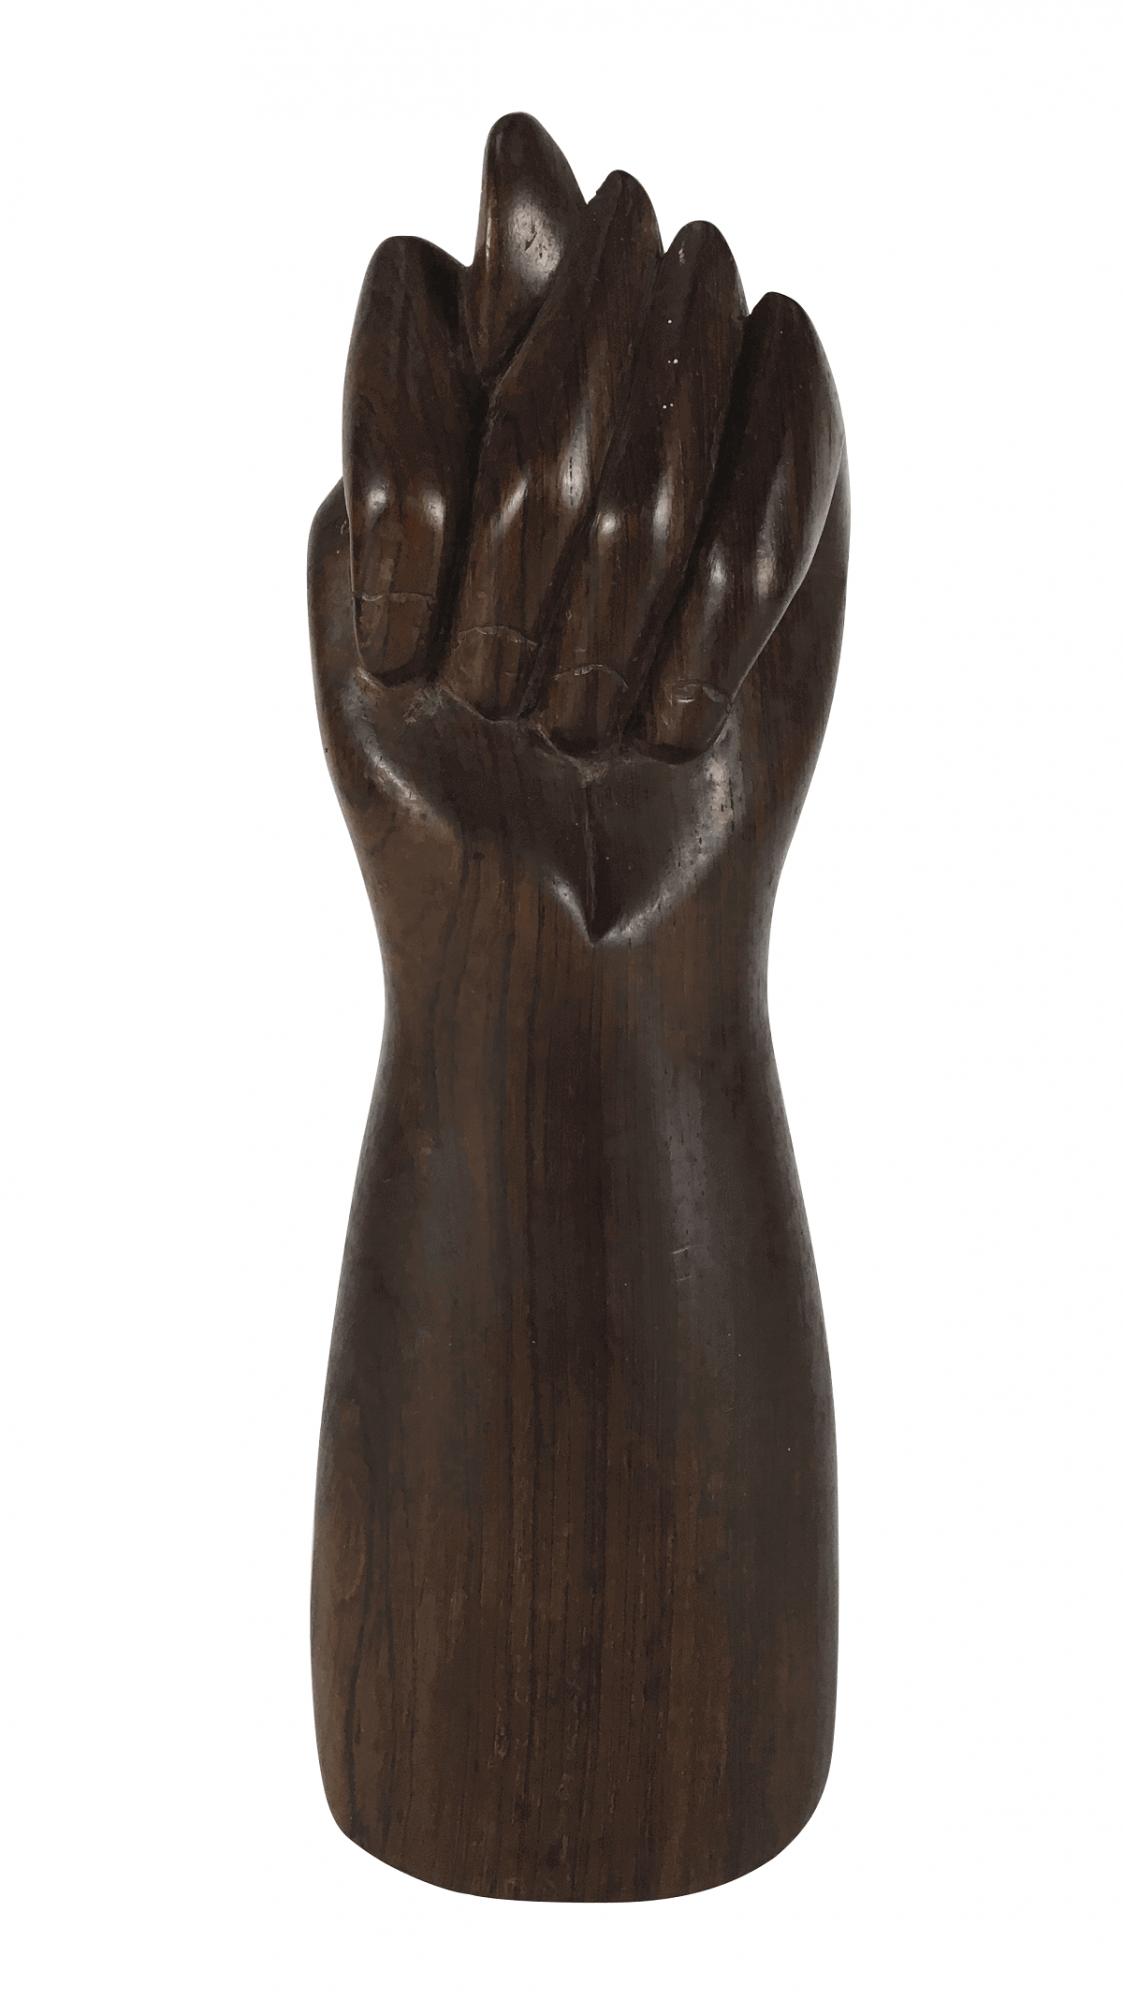 Escultura Figa Antiga Madeira Jacaranda